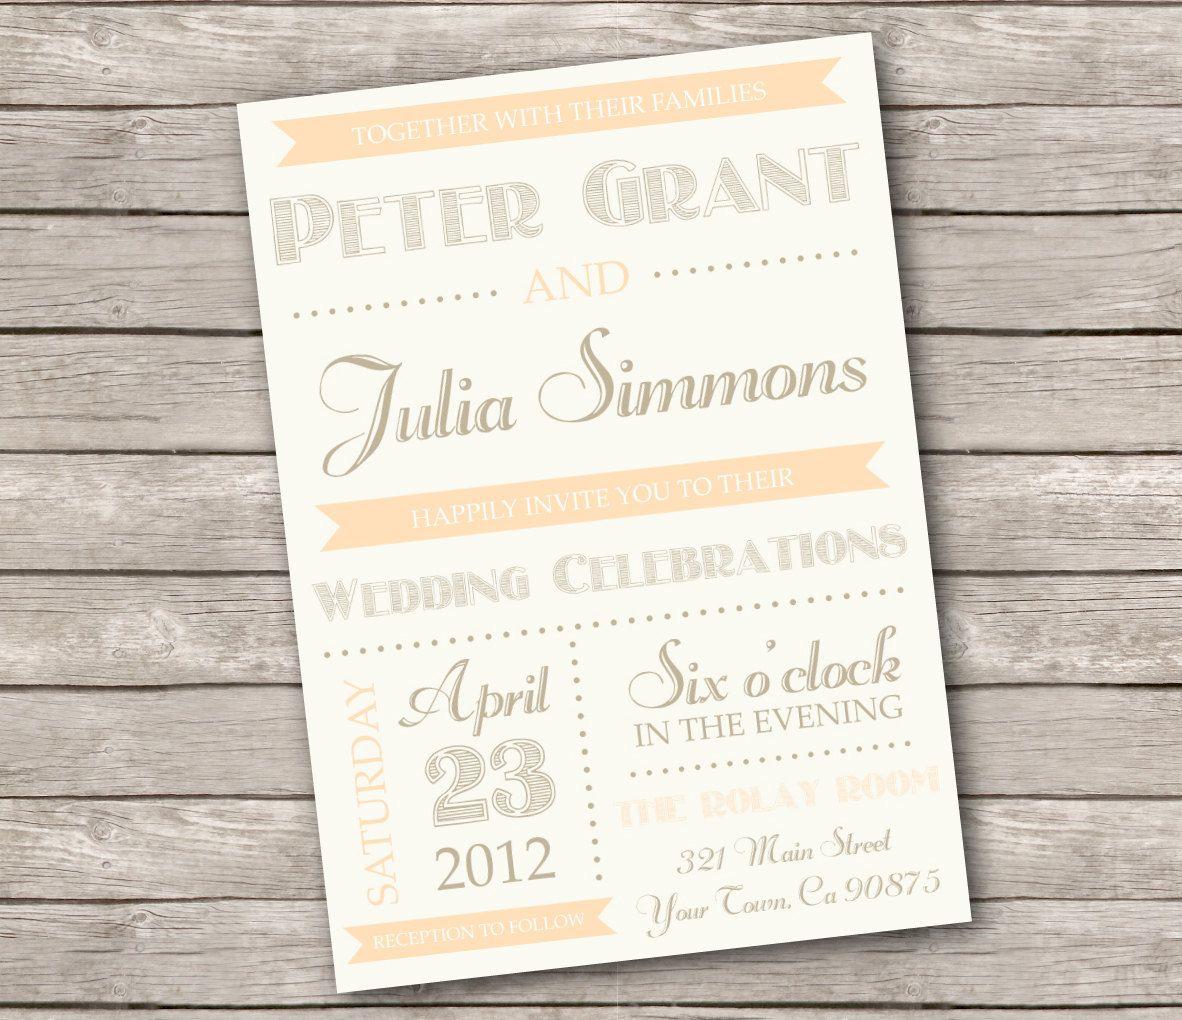 Vintage Wedding Invitations Etsy | Wedding Invite Vintage | Pinterest